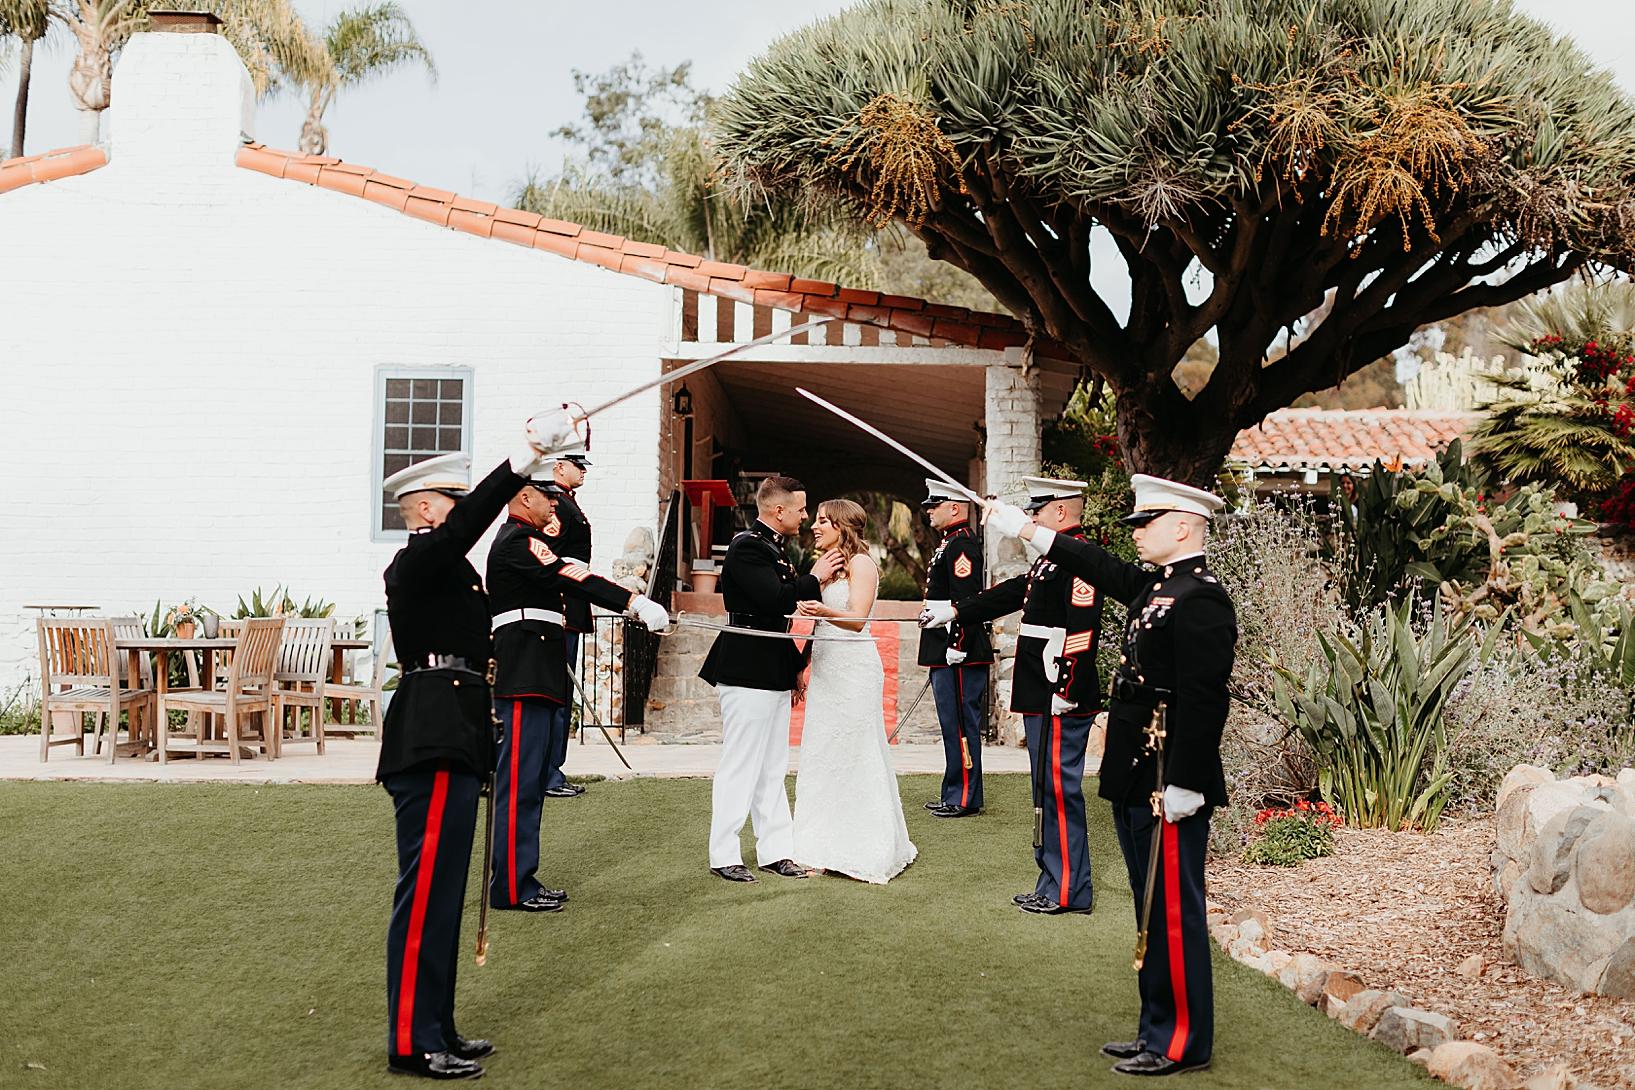 Leo-Carrillo-Ranch-Wedding-74.jpg